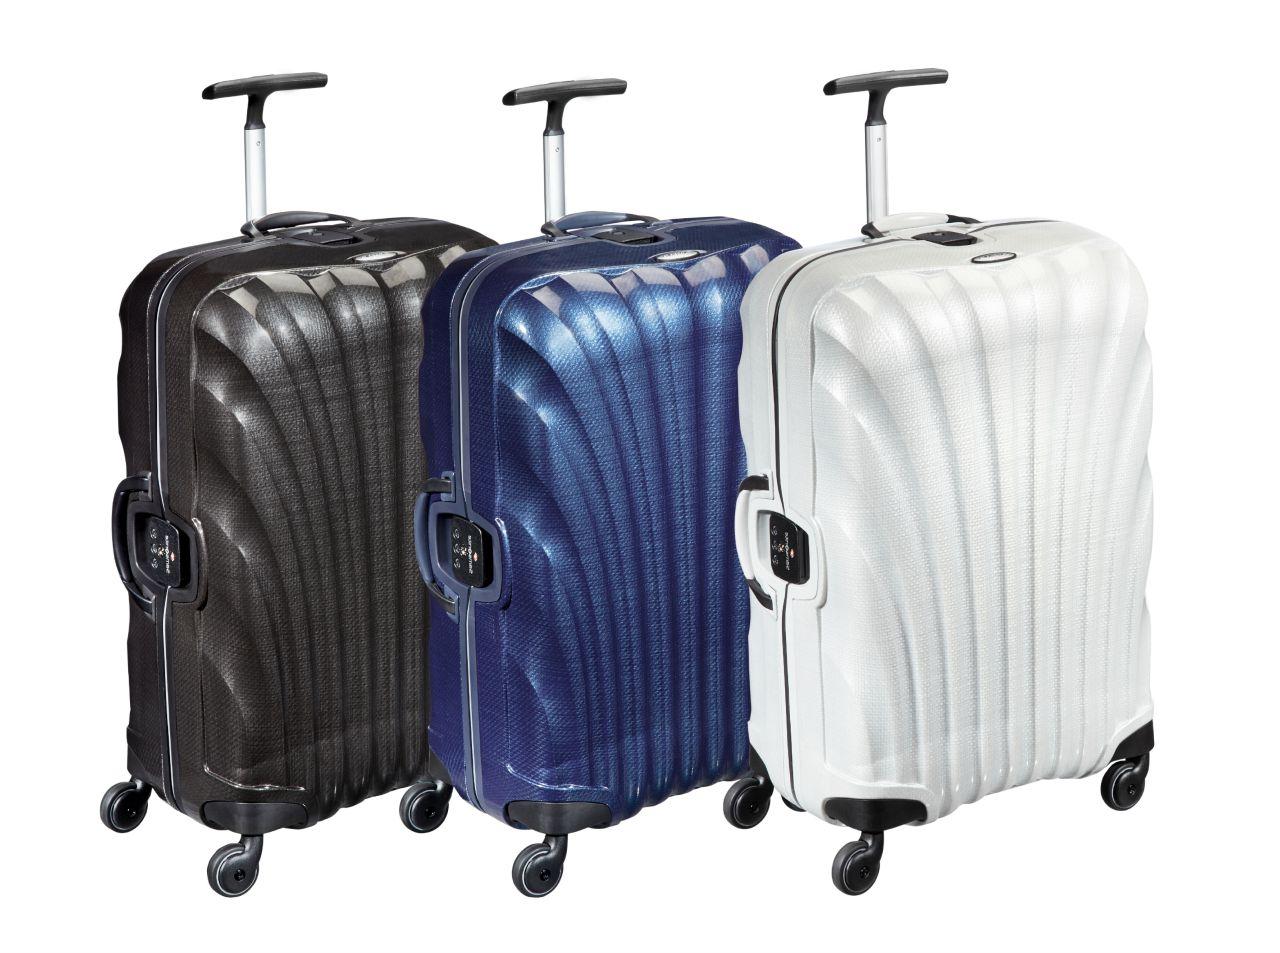 valises-cabine-avion